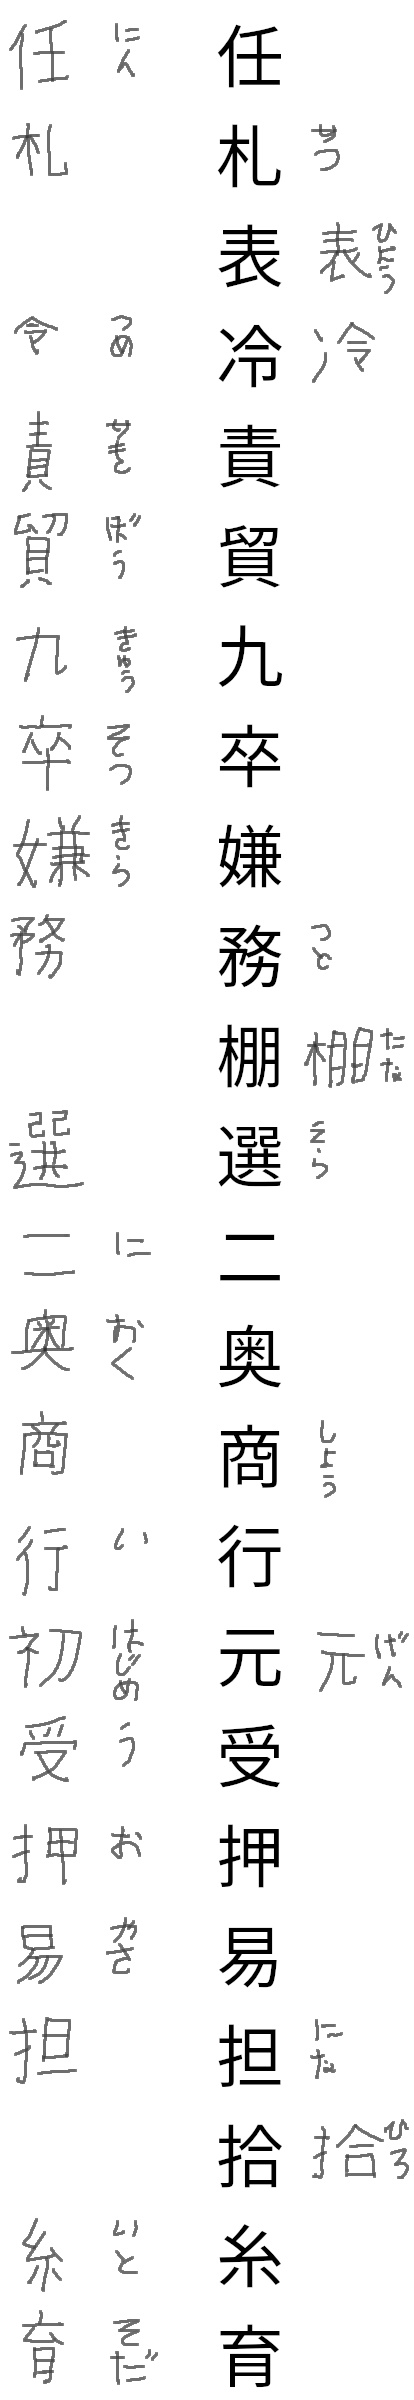 kanji test row 30